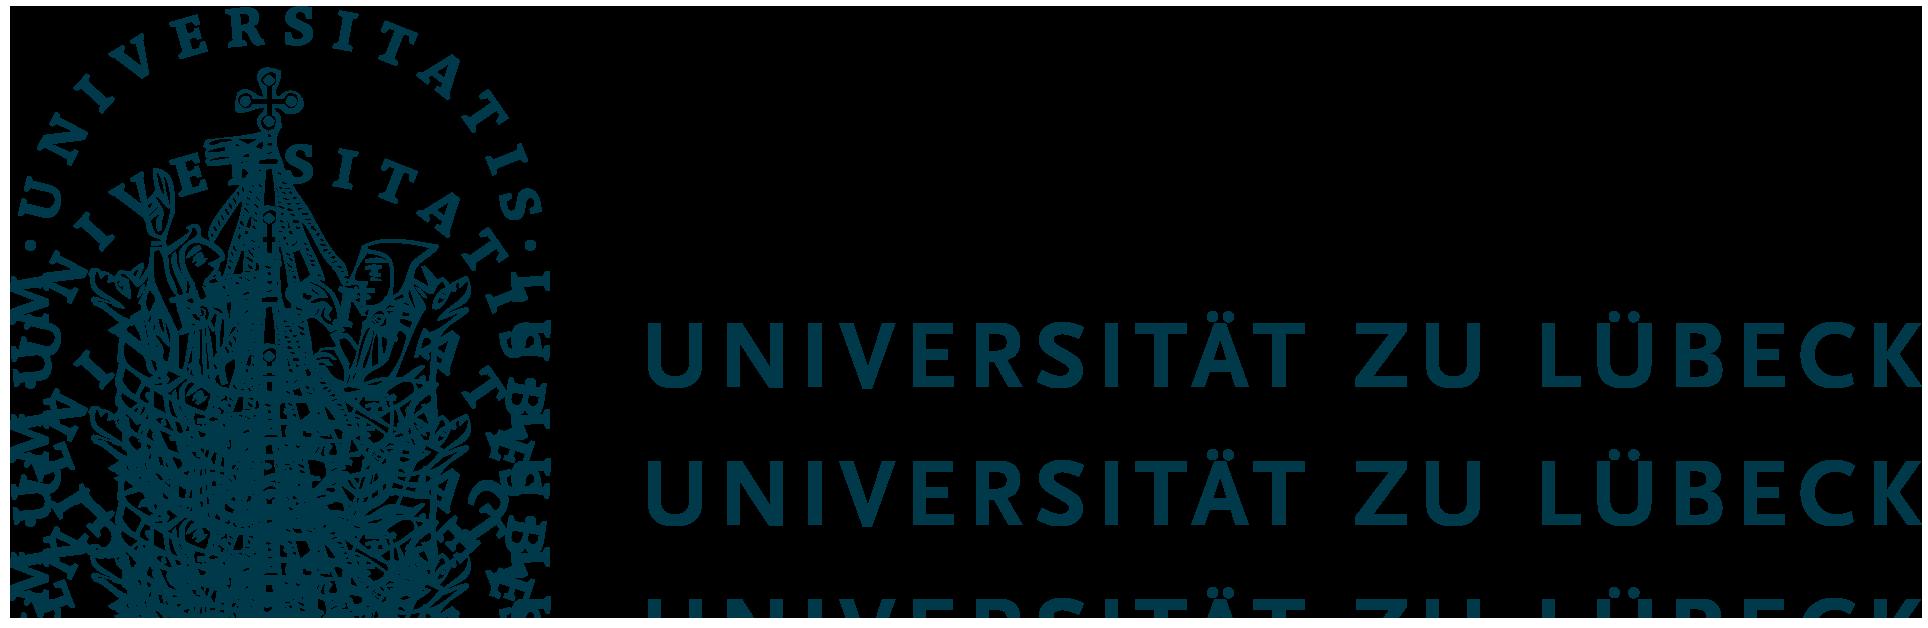 Research Scientists (m/f/d) - Universität zu Lübeck - Logo